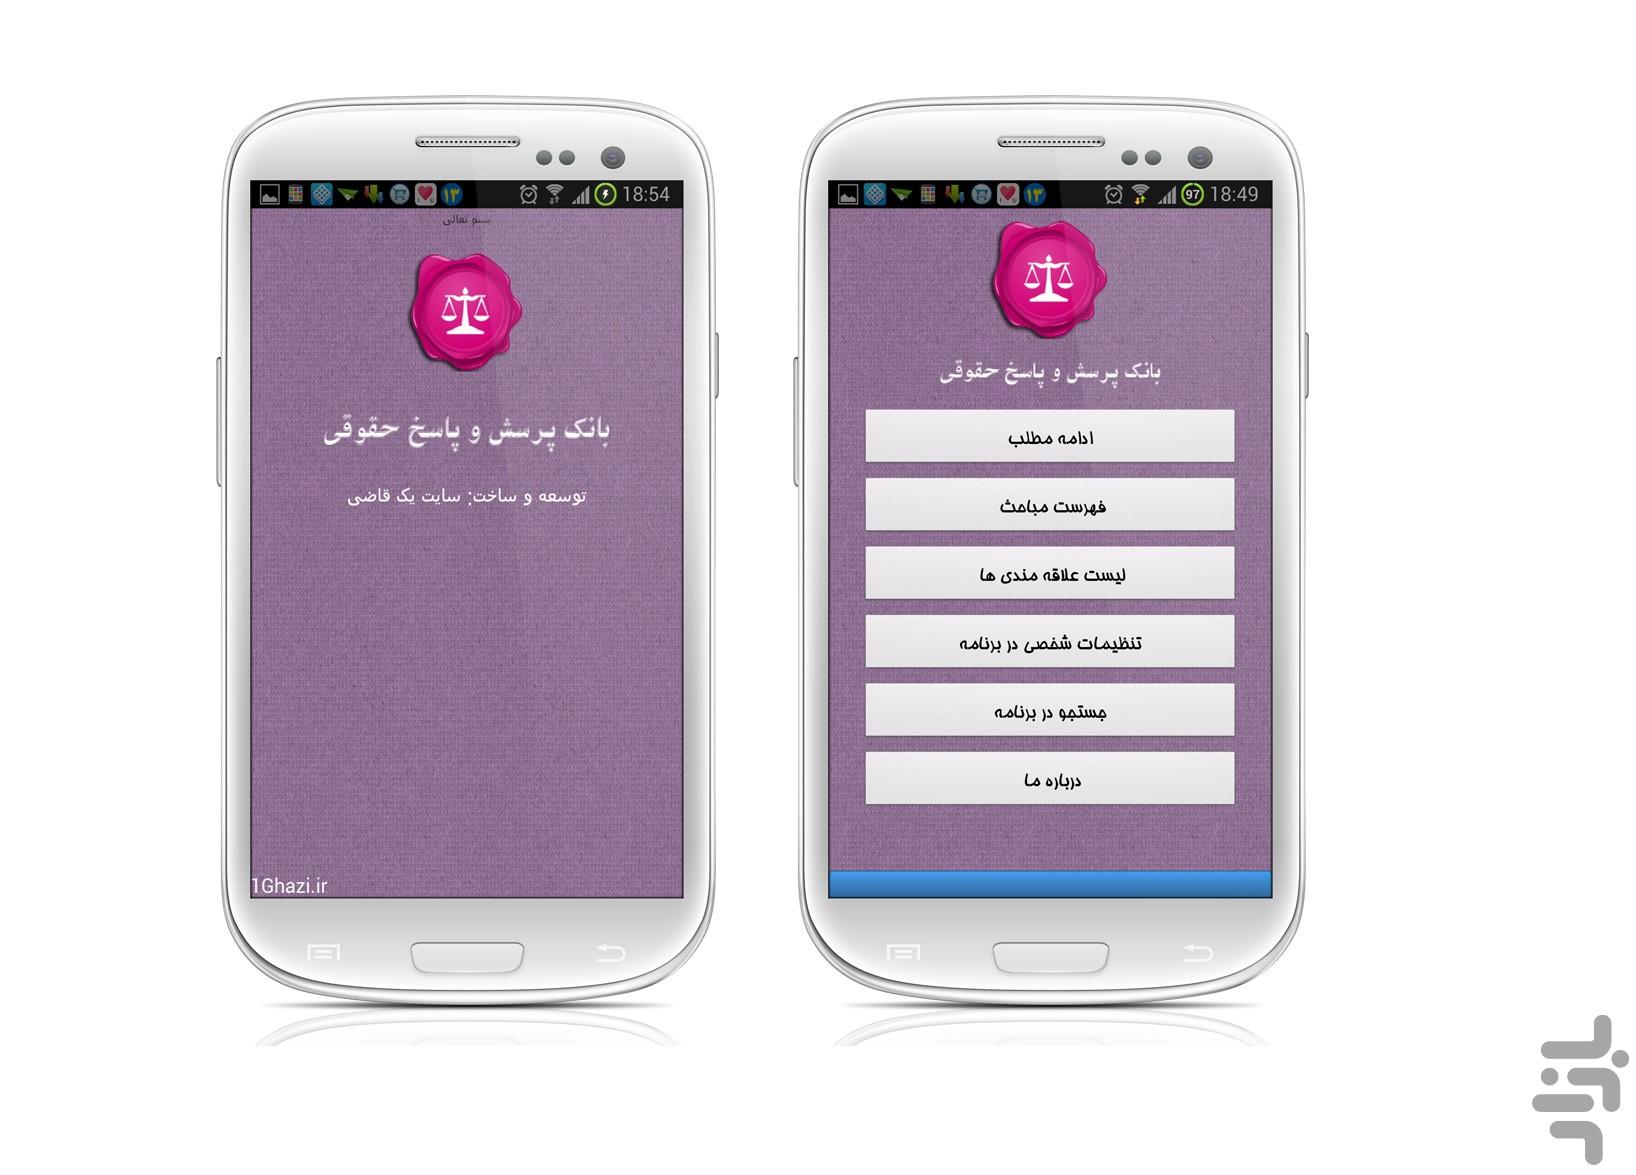 http://s.cafebazaar.ir/1/upload/screenshot/ir.Ghazi.parsababaei0.jpg